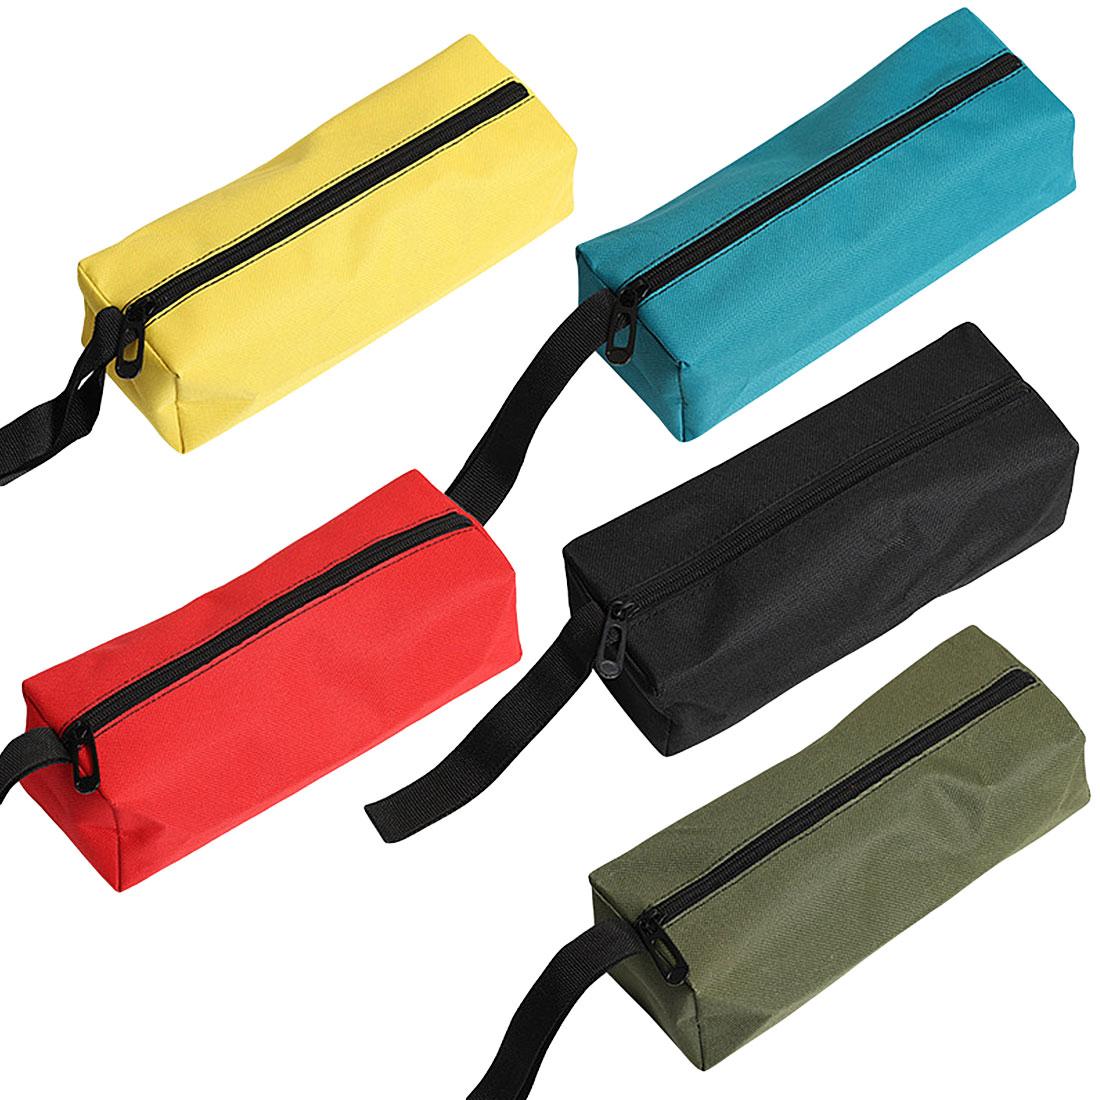 Waterproof Storage Hand Tool Bag Oxford Canvas  Screws Nails Drill Bit Metal Parts Fishing Travel Makeup Organizer Pouch Bag